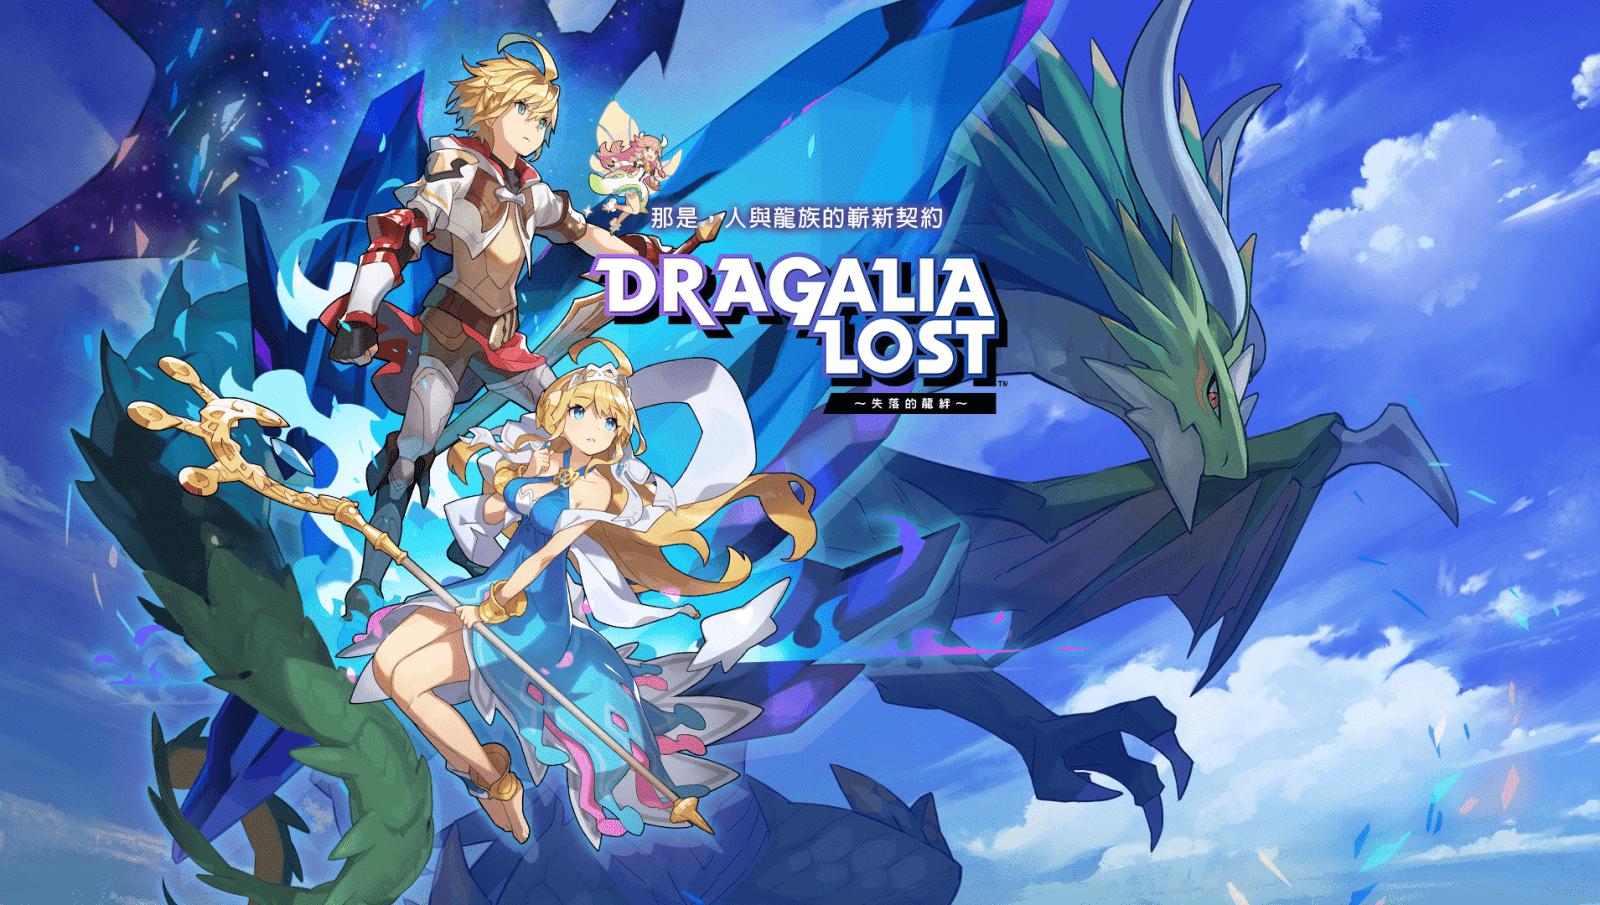 Dragalia Lost, Nintendo's hit gacha RPG, is getting cheaper summons this week